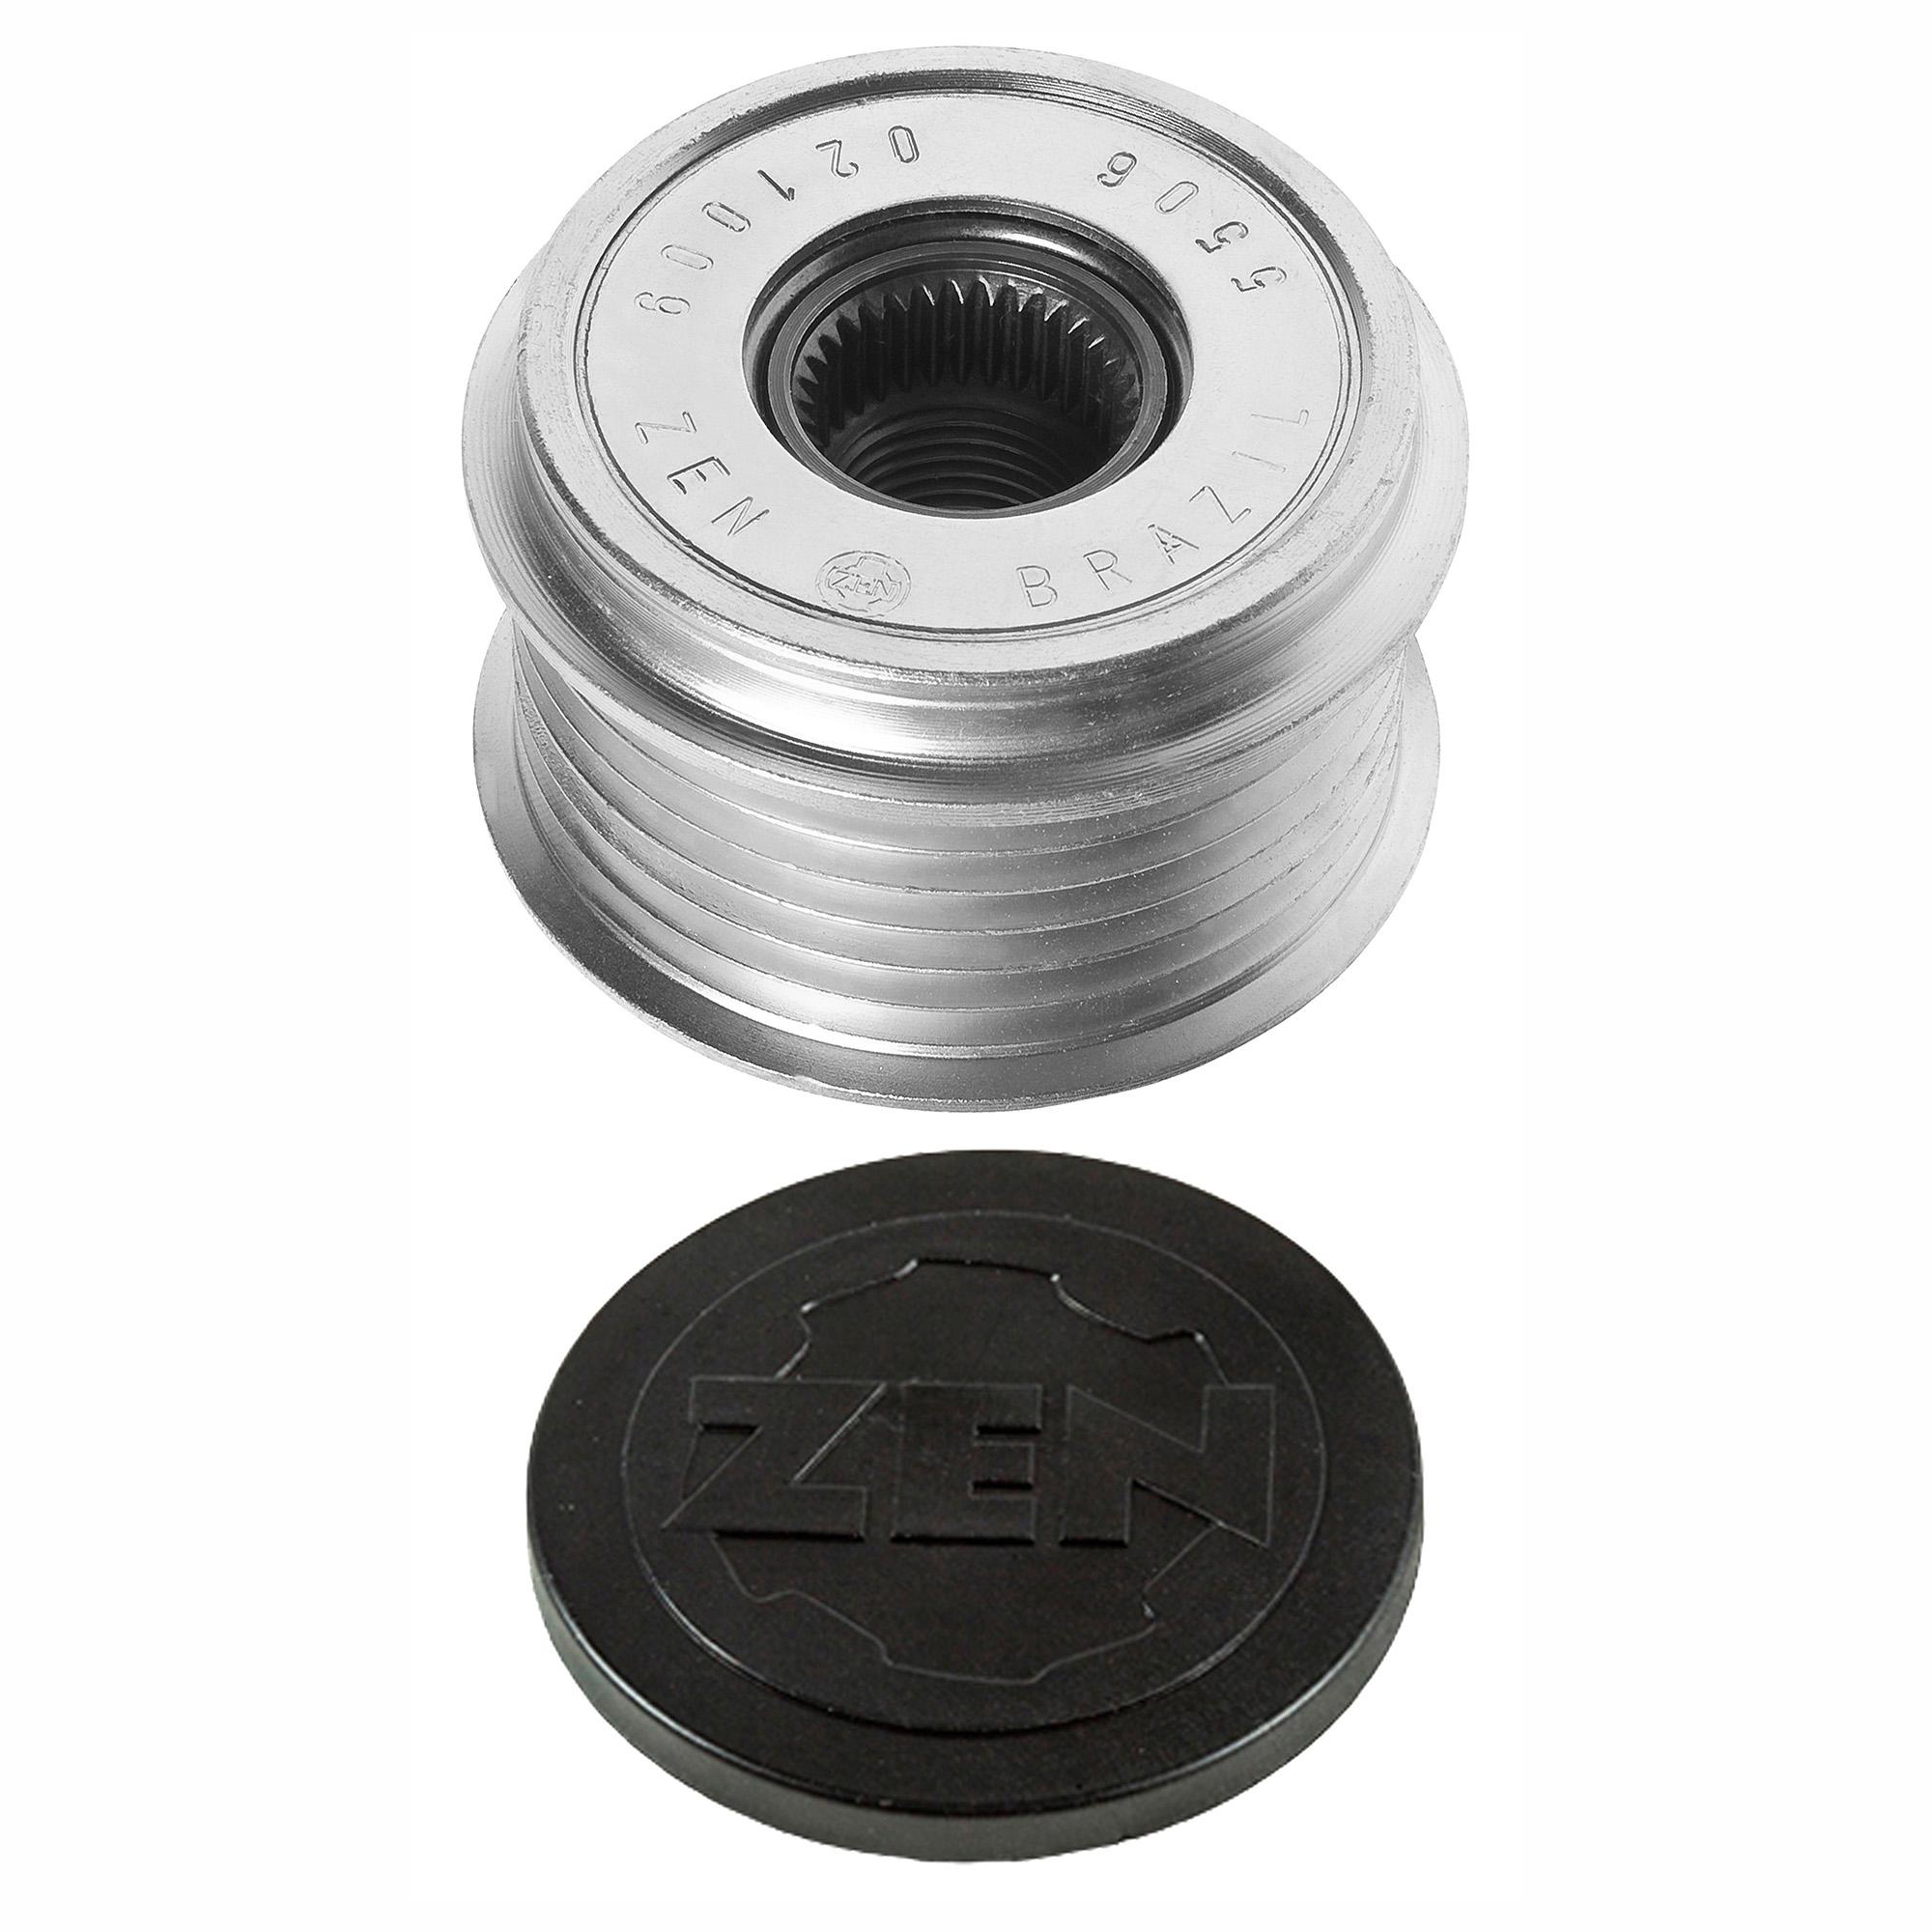 Polia Alternador Roda Livre TRANSIT 2.3 - 16V (ZEN5506)